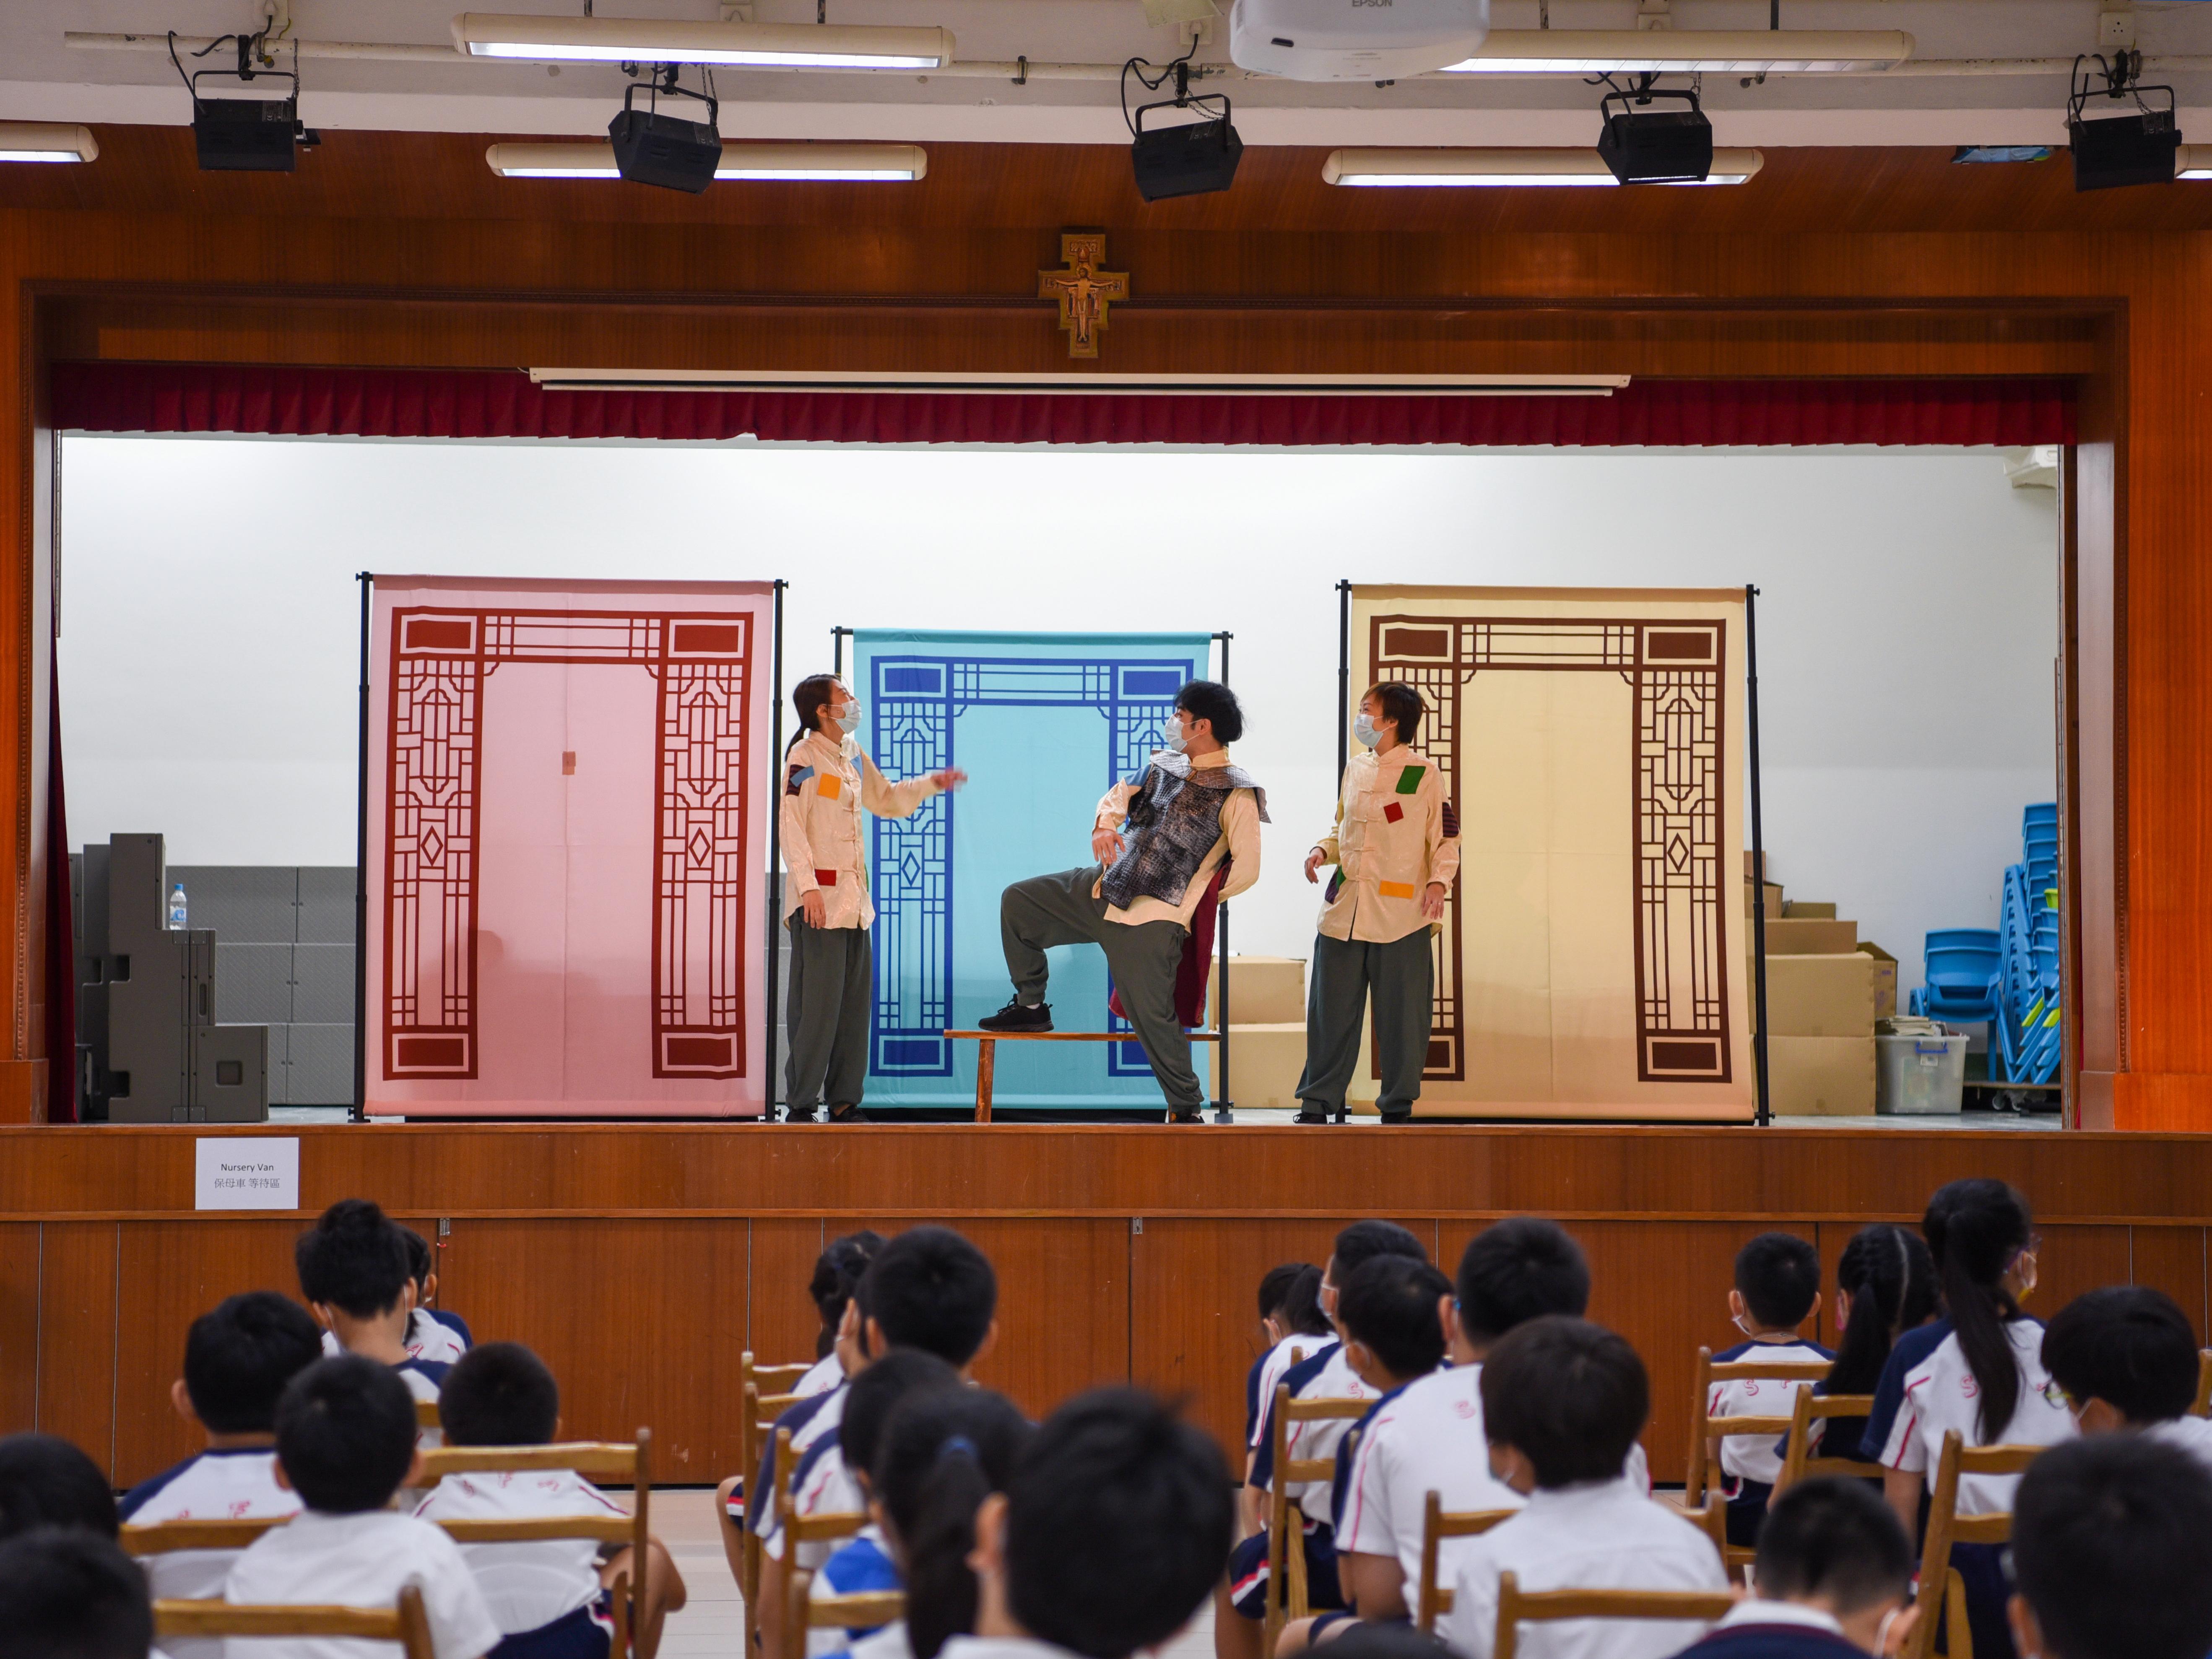 https://sfaeps.edu.hk/sites/default/files/dsc_2013.jpg